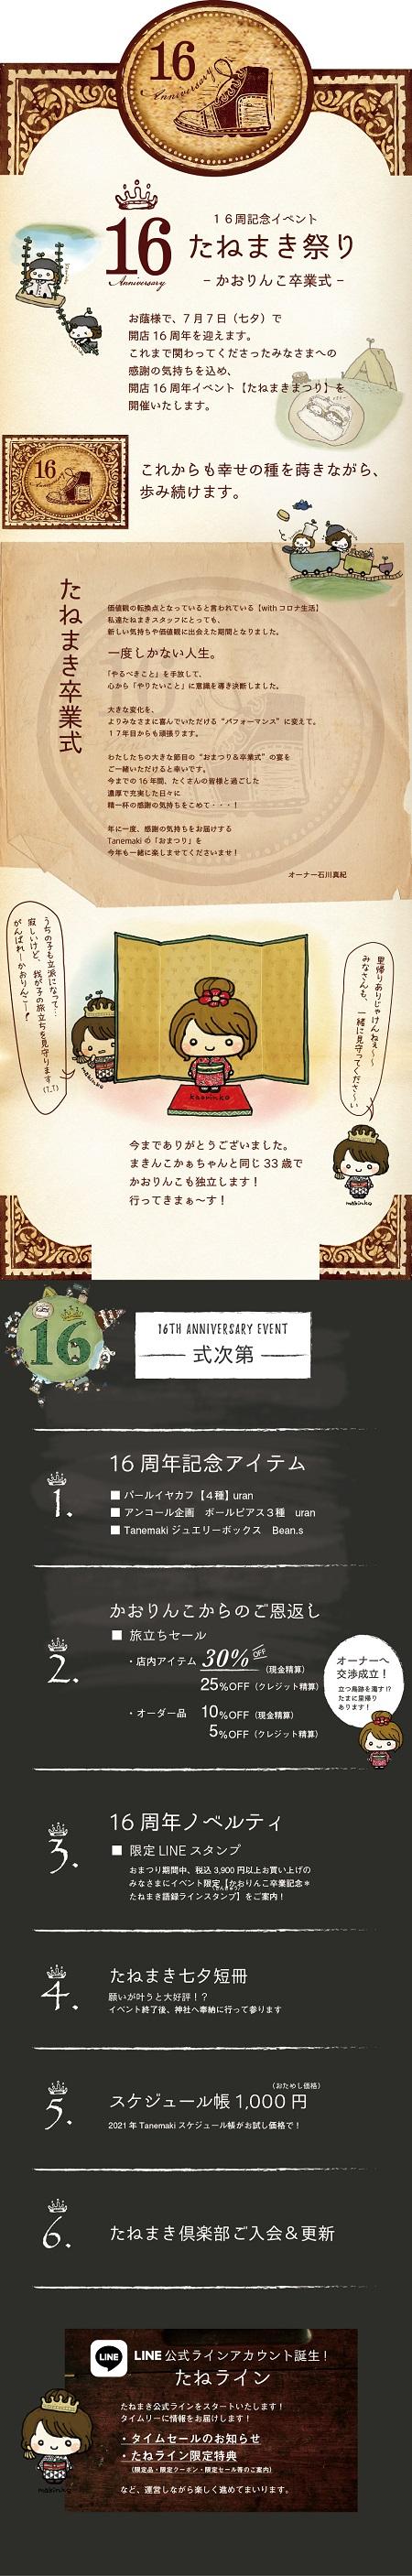 16th_menu.jpg